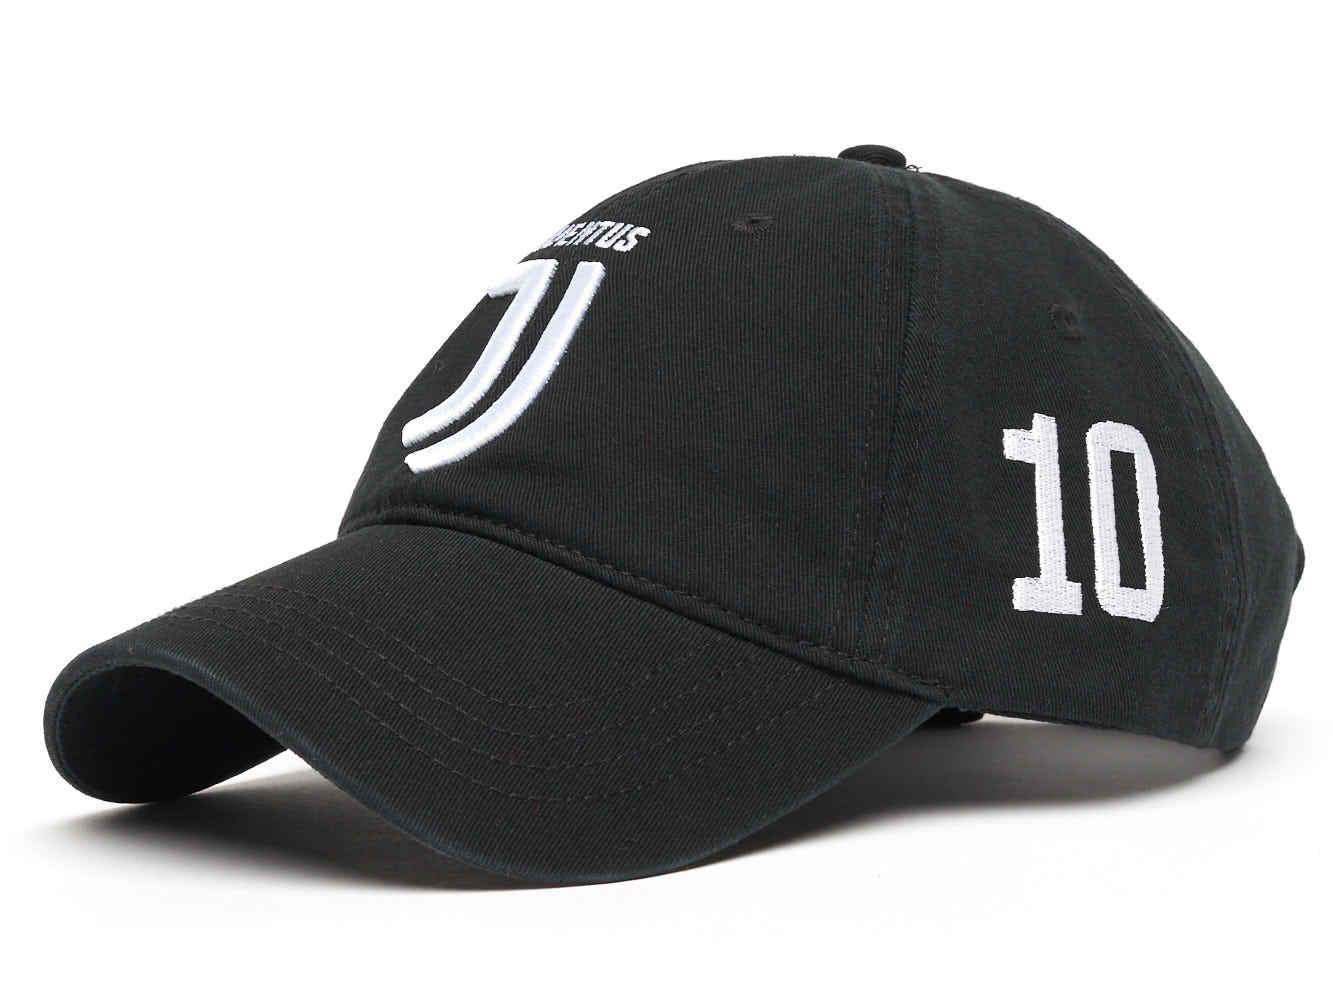 Бейсболка Ювентус № 10